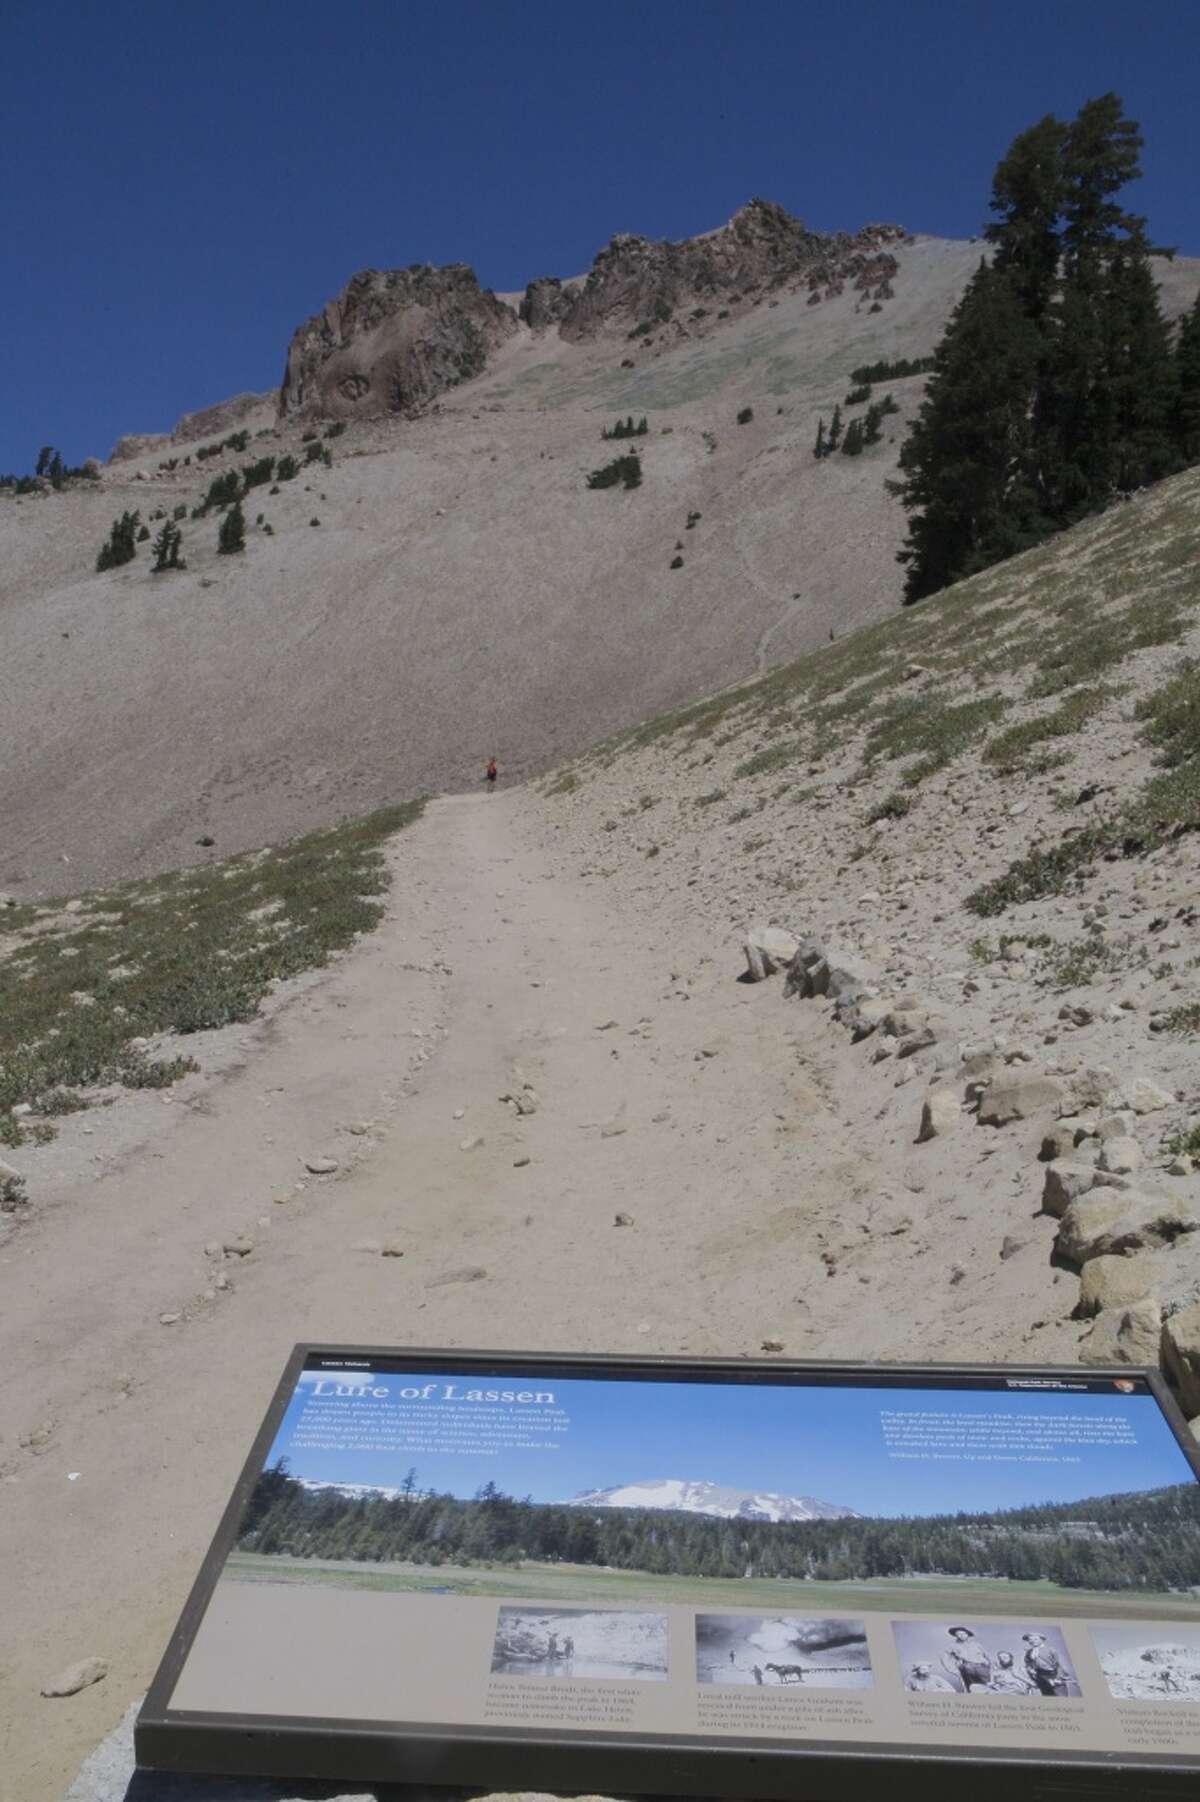 Trailhead for Lassen Peak is at 8,500 feet near the summit of the Lassen Park Highway